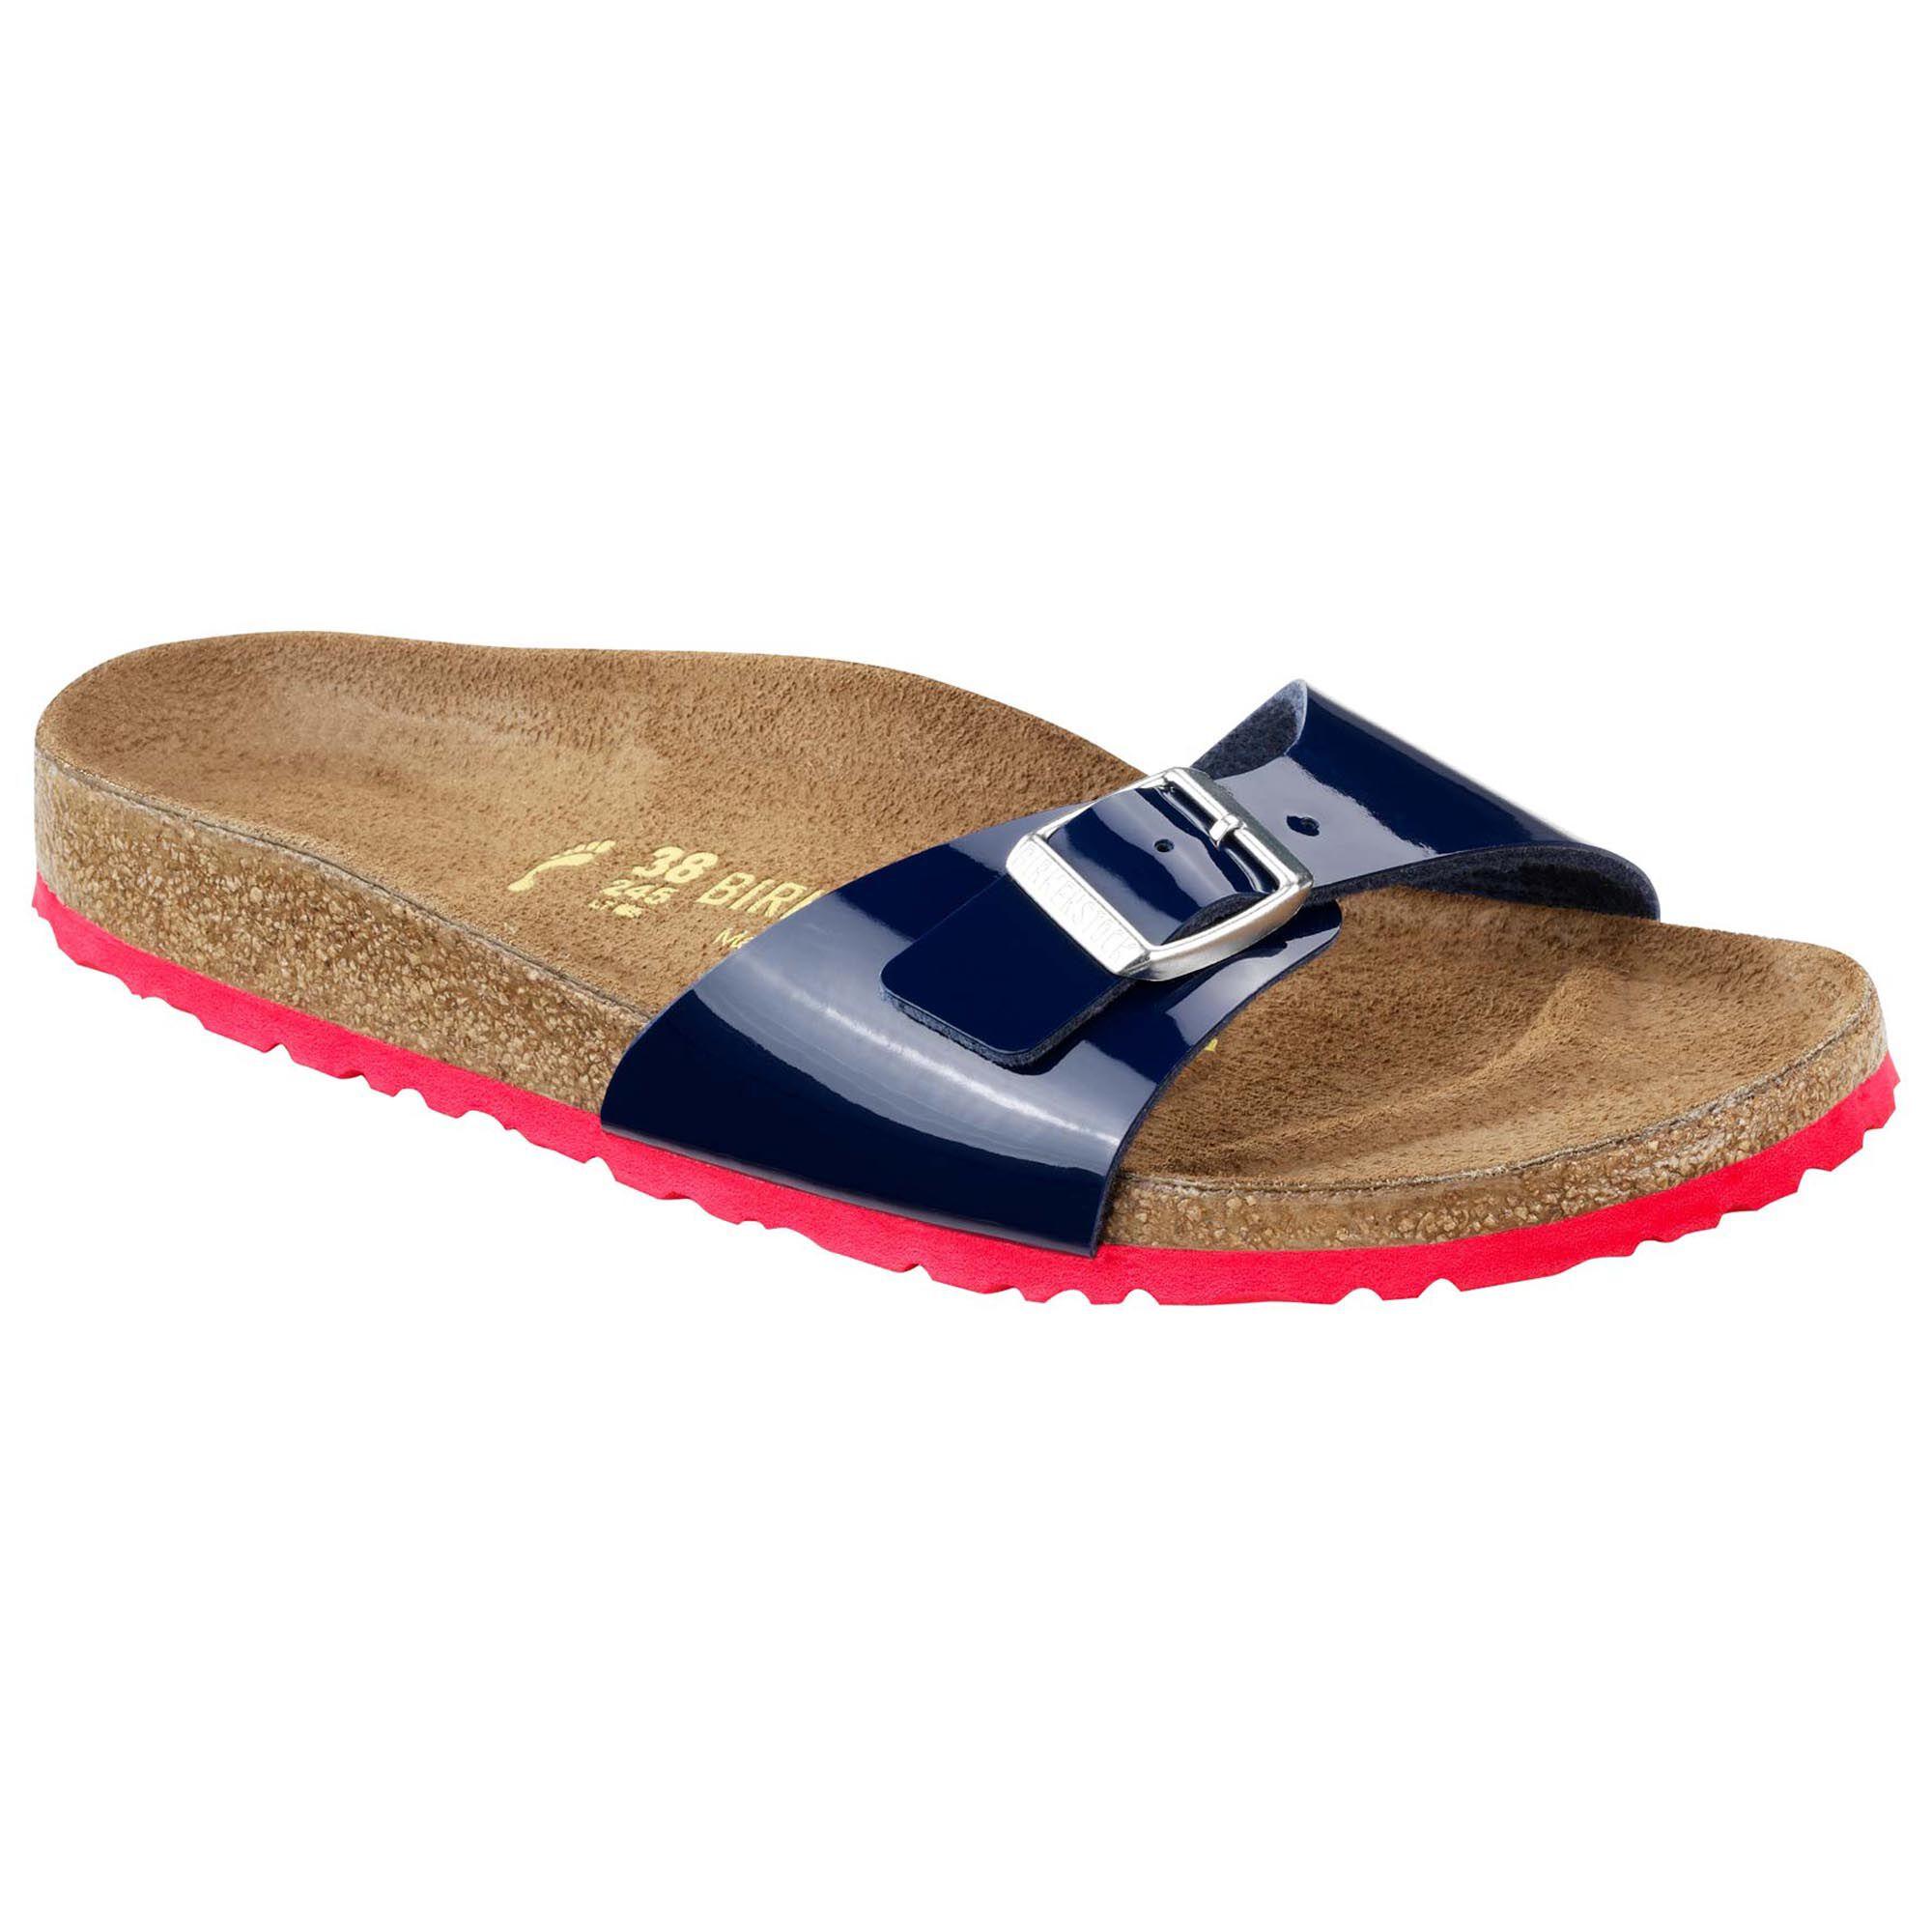 nokkAPb5Mj Damen Pantoletten Madrid blue Footlocker Abbildungen Günstigen Preis Große Überraschung Verkauf Online Rabatt-Shop 0qW4hm